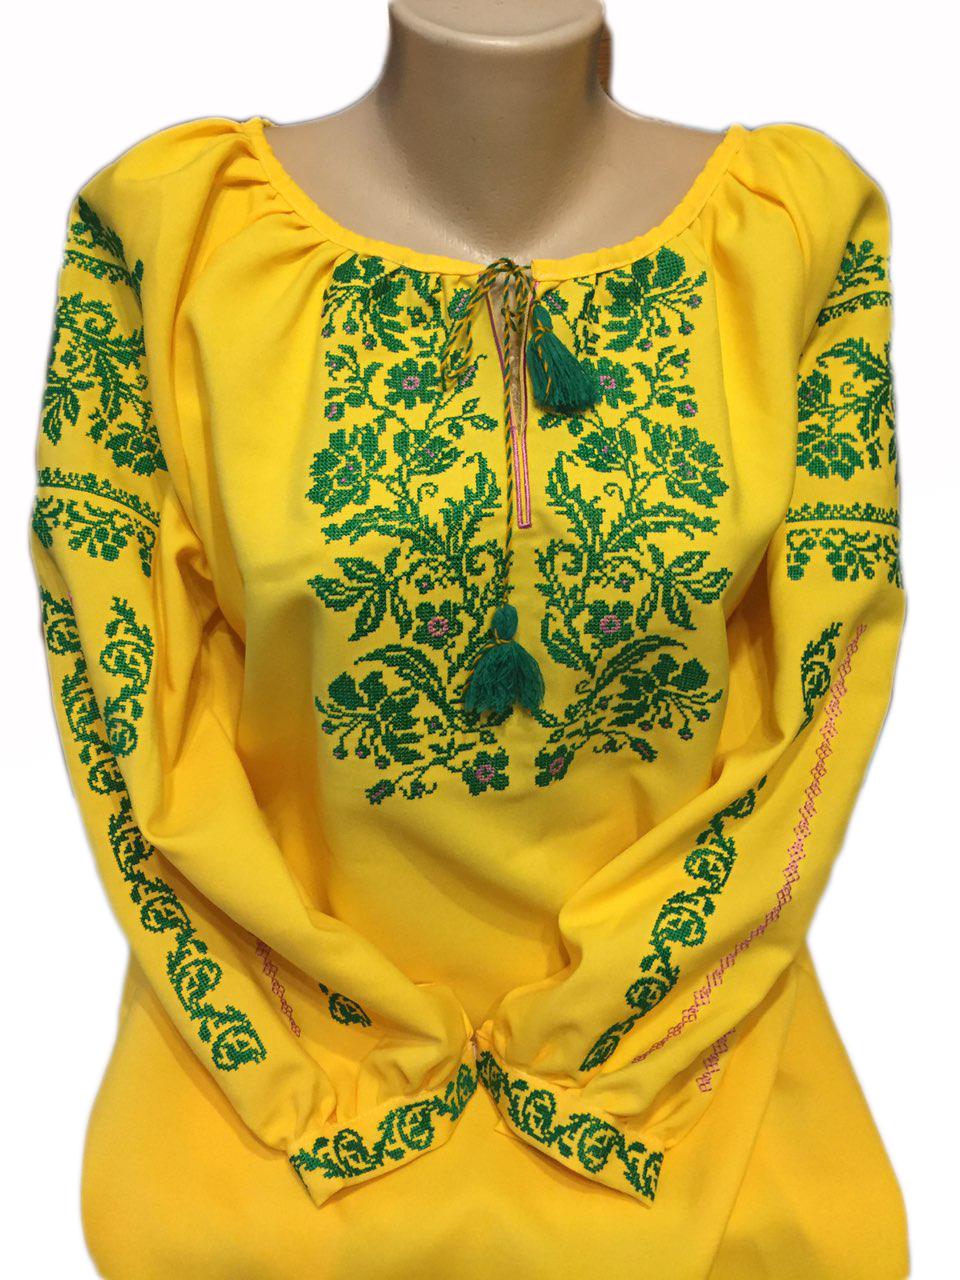 "Жіноча вишита сорочка (блузка) ""Ротлін"" (Женская вышитая рубашка (блузка) ""Ротлин"") BI-0025"